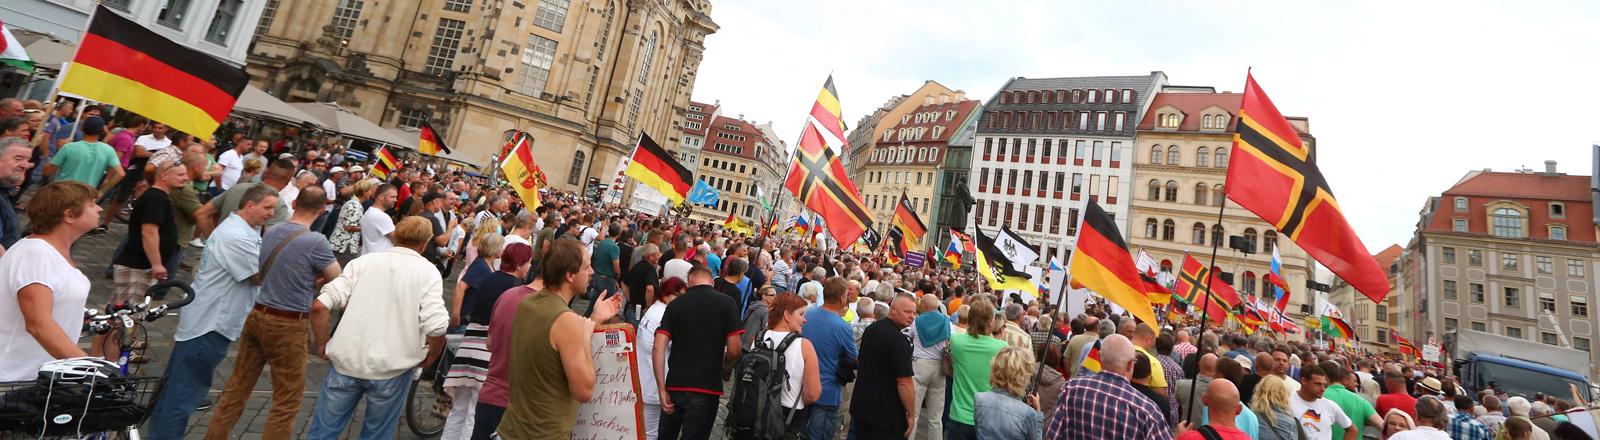 Pegida-Demonstration in Dresden am 29.08.2016.